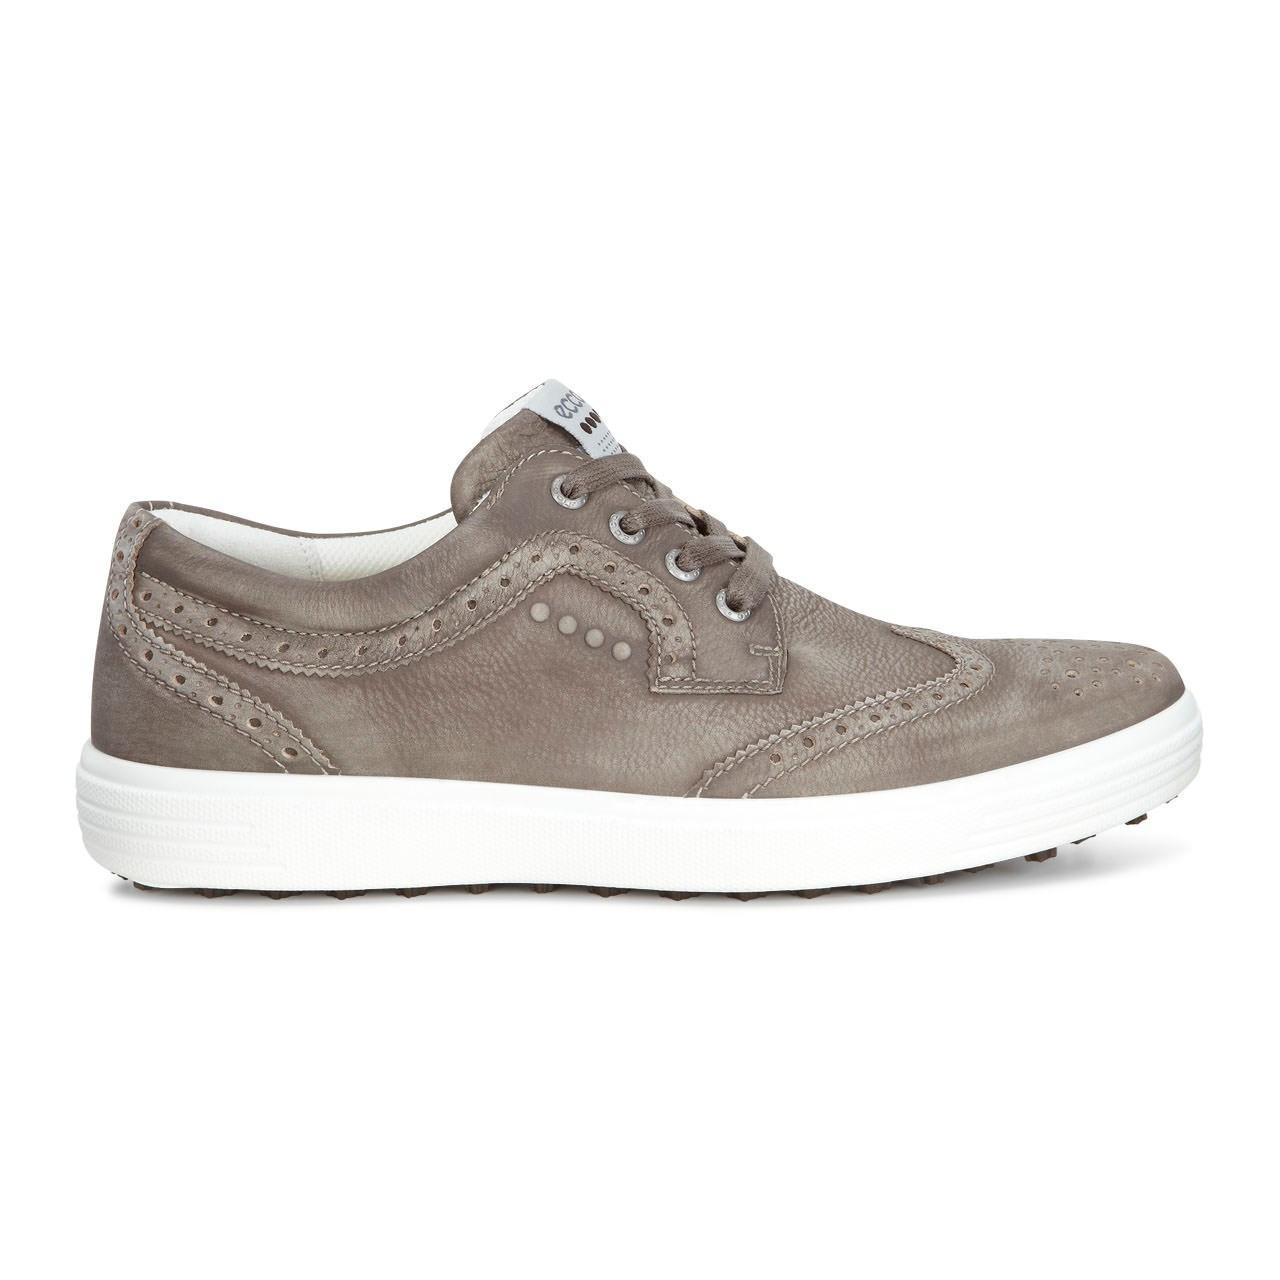 0451d2147eb3 Ecco Men s Casual Hybrid Golf Shoes Dark Clay Size 45 (UK 10.5 ...